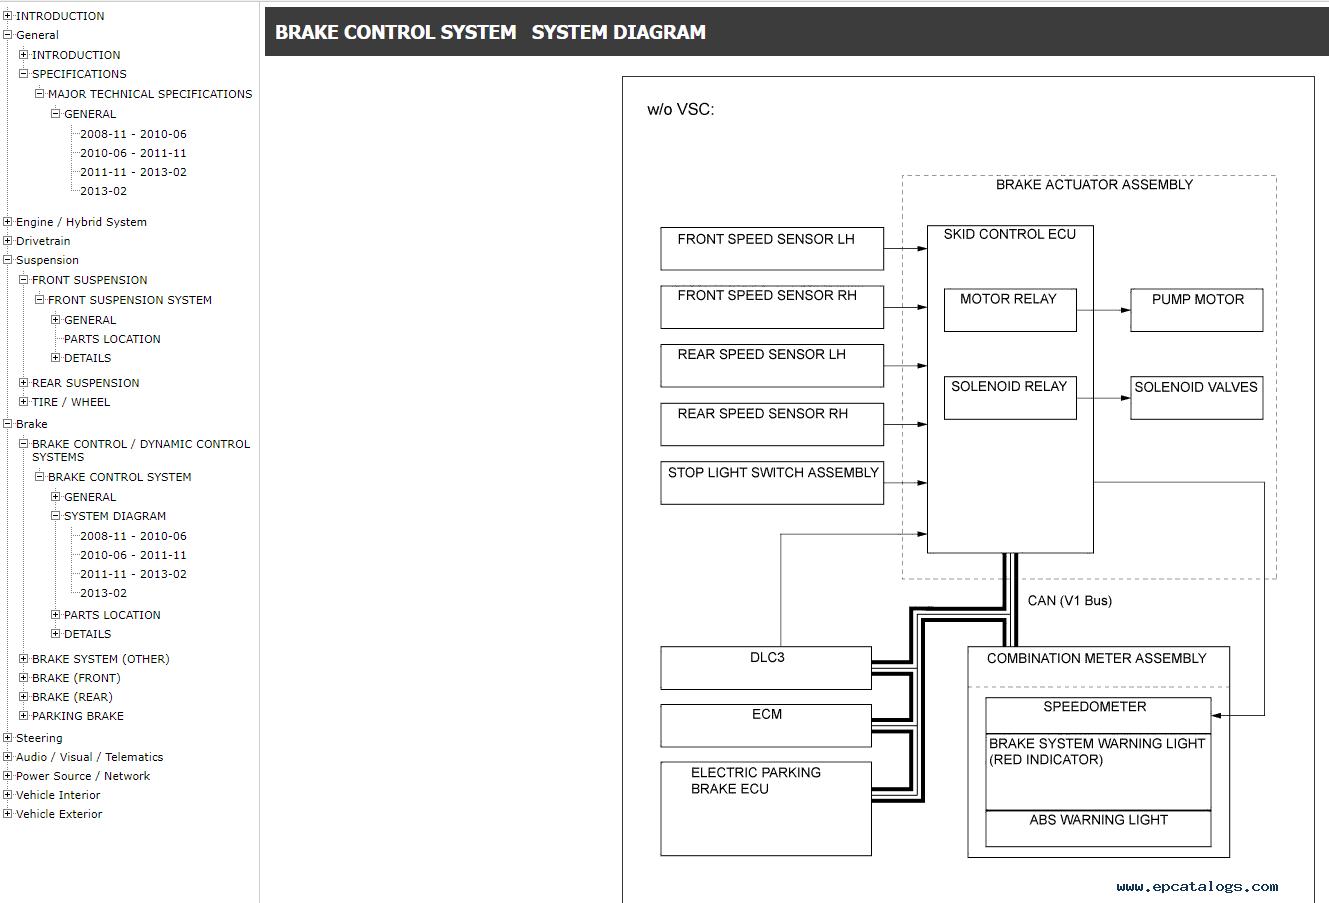 toyota avensis petrol azt270 zrt270 271 272 repair manual 84 toyota wiring diagram toyota wiring diagram abbreviations